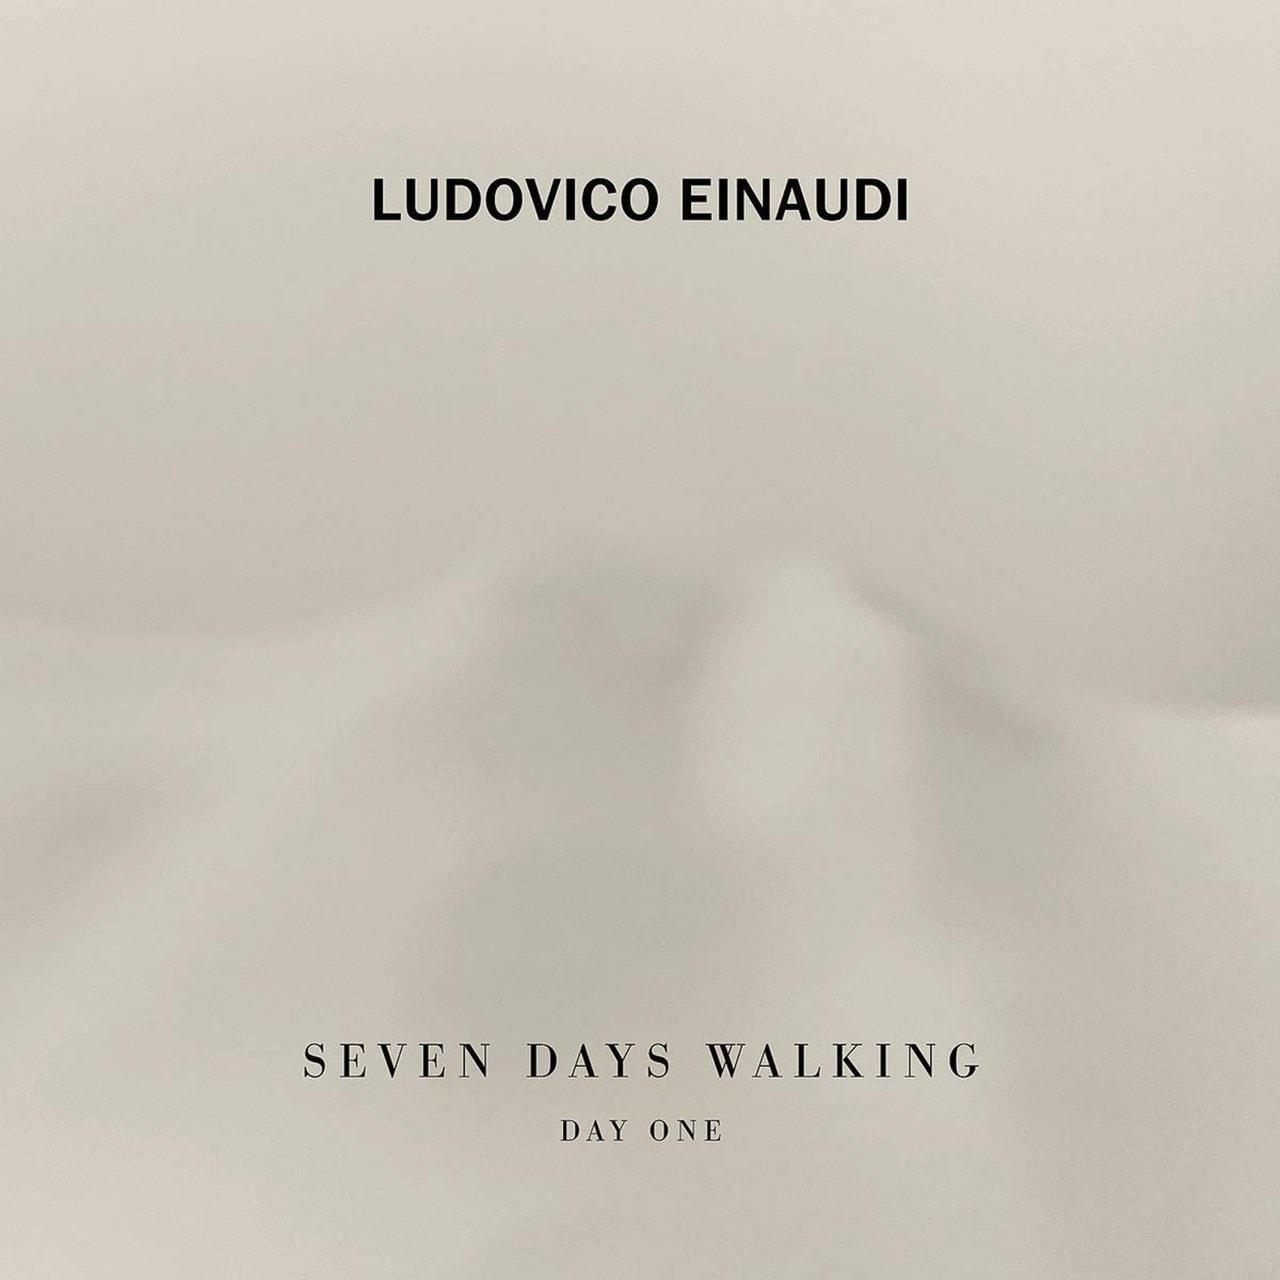 Ludovico Einaudi: Seven Days Walking - Day One - 1